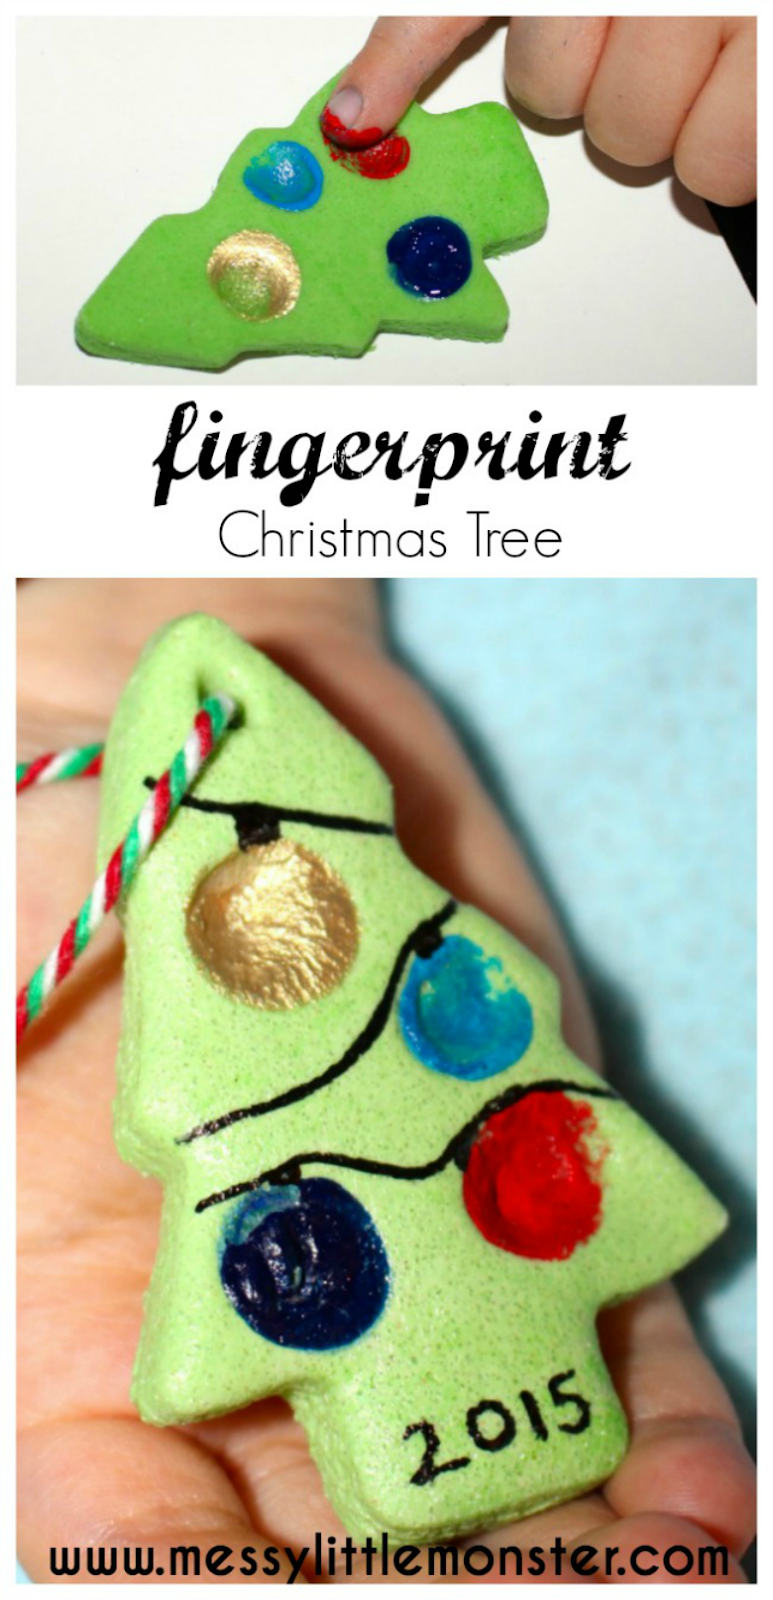 Fingerprint Christmas Tree - Salt Dough Ornament Recipe